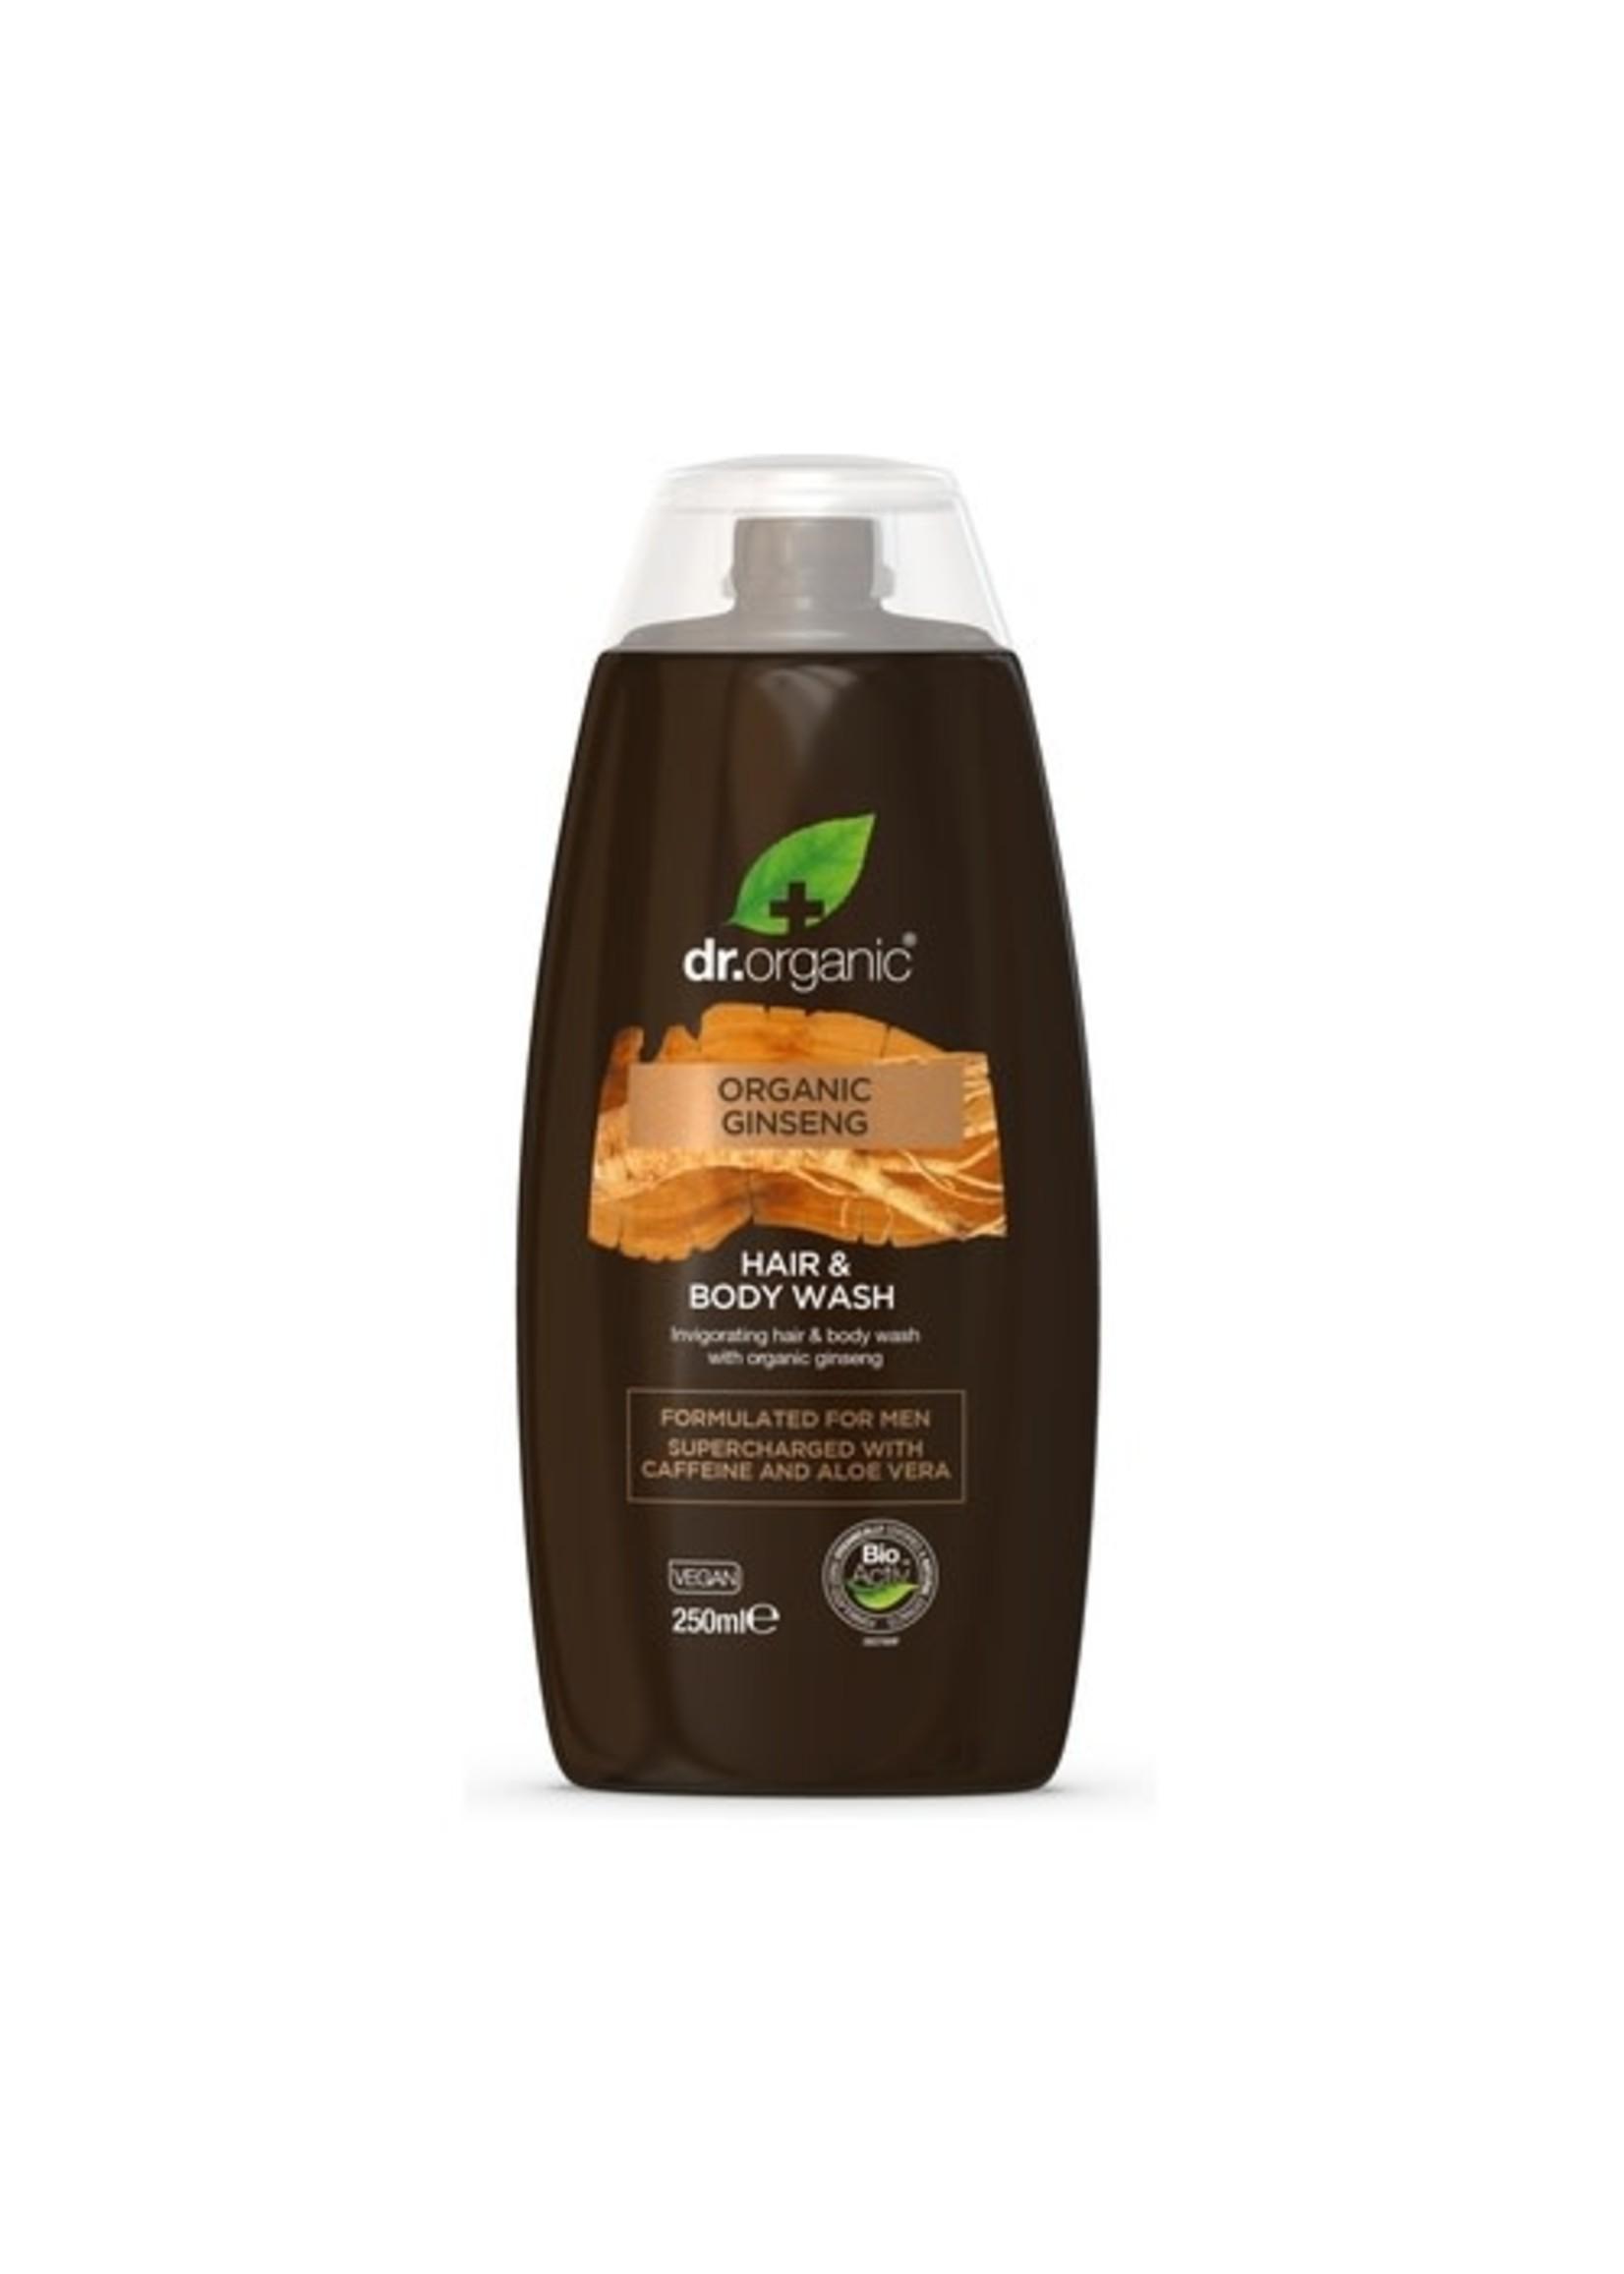 Dr Organic Dr Organic Men's Hair & Body Wash with Ginseng  250ml